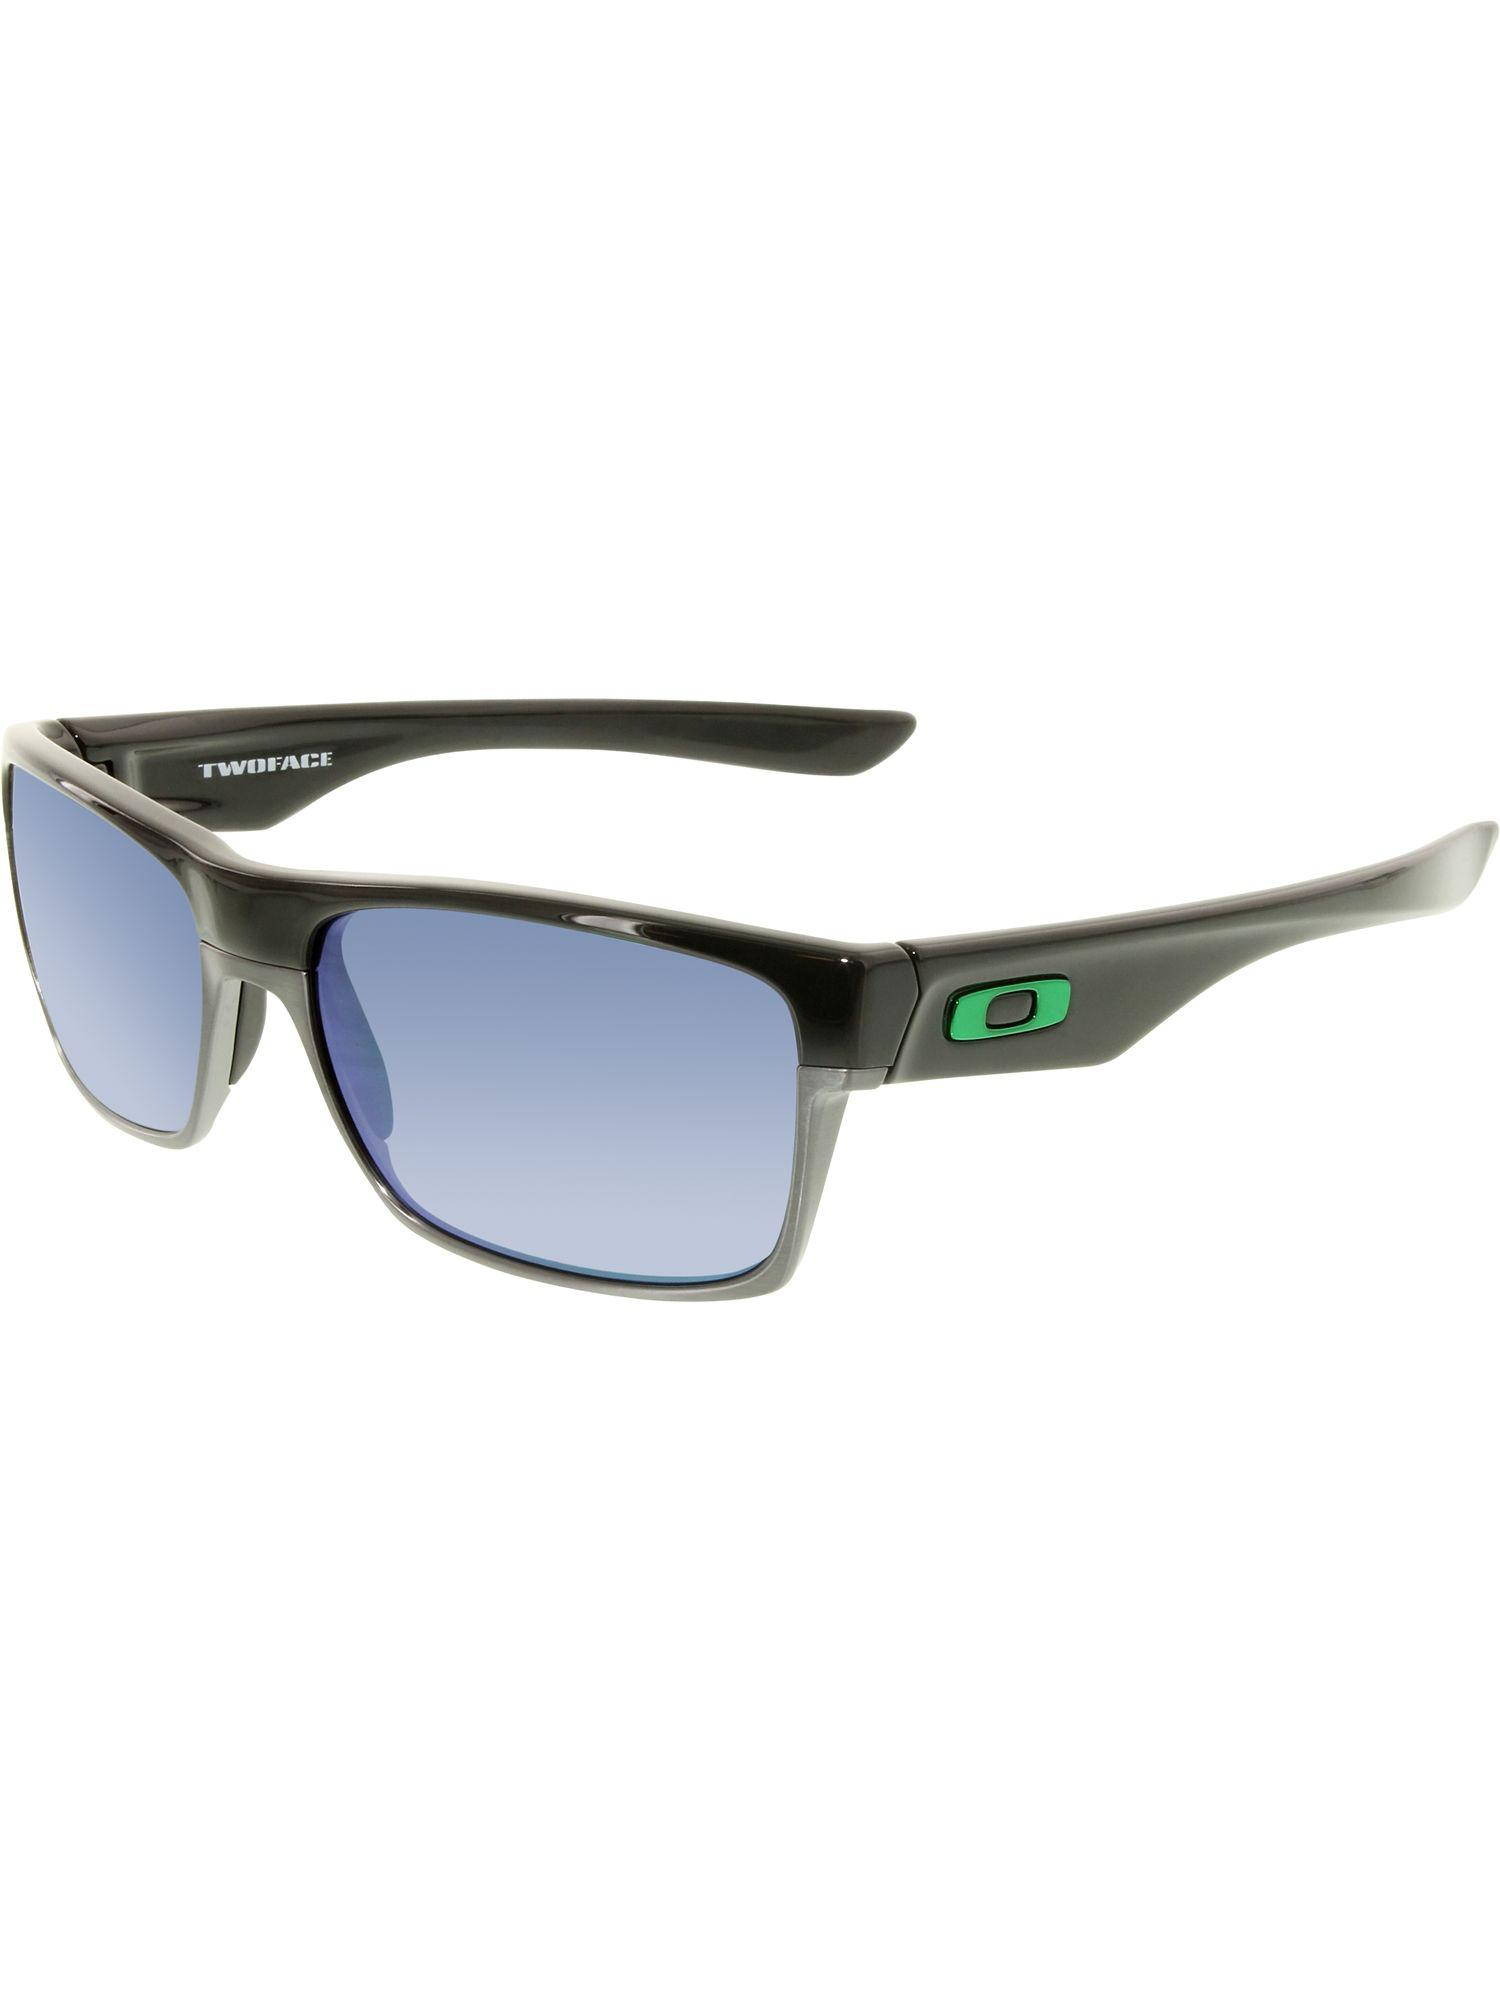 64a0d92f4d Lyst - Oakley Men s Twoface Oo9189-04 Black Square Sunglasses in ...